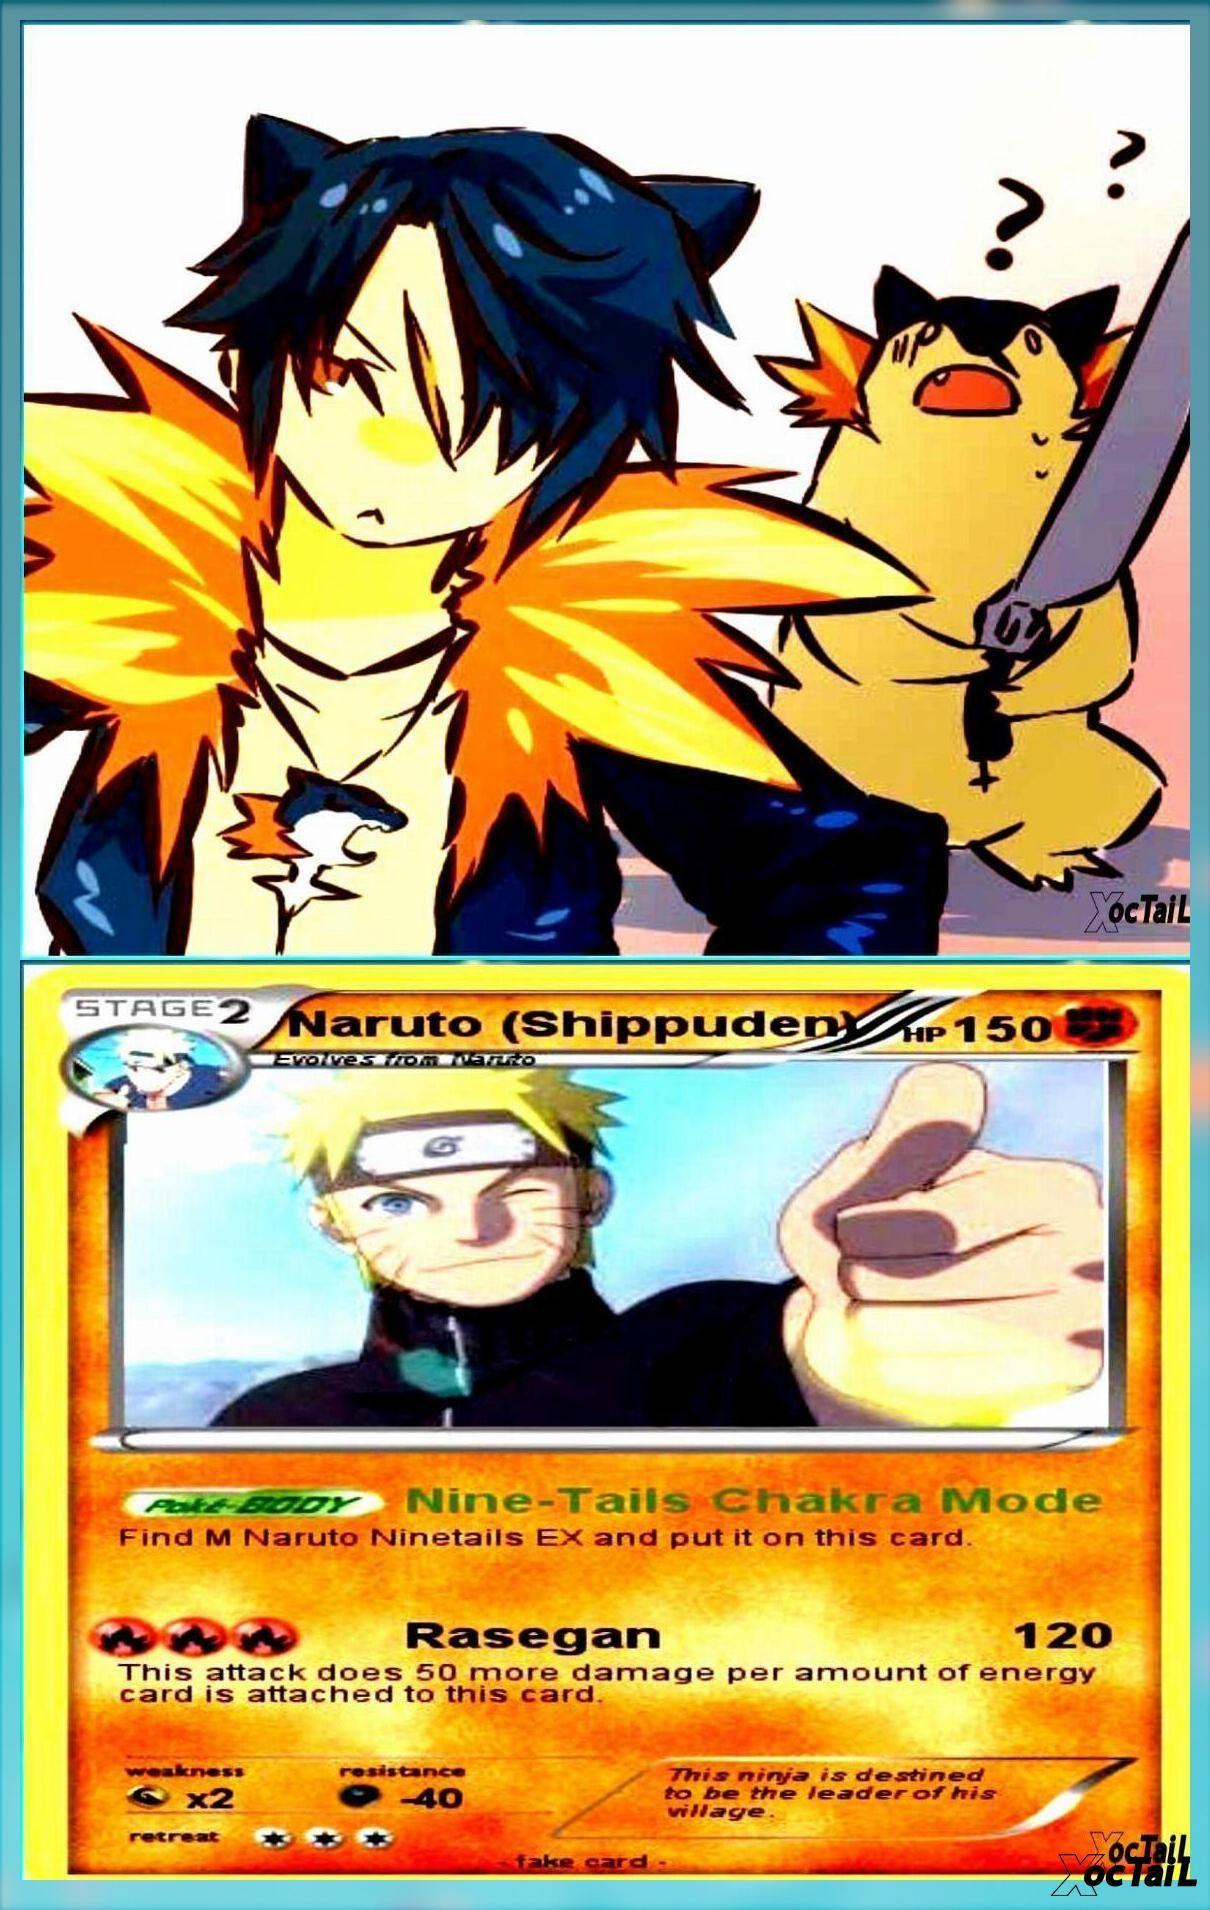 Crunchyroll Forum Pokemon/Naruto Crossover in 2020